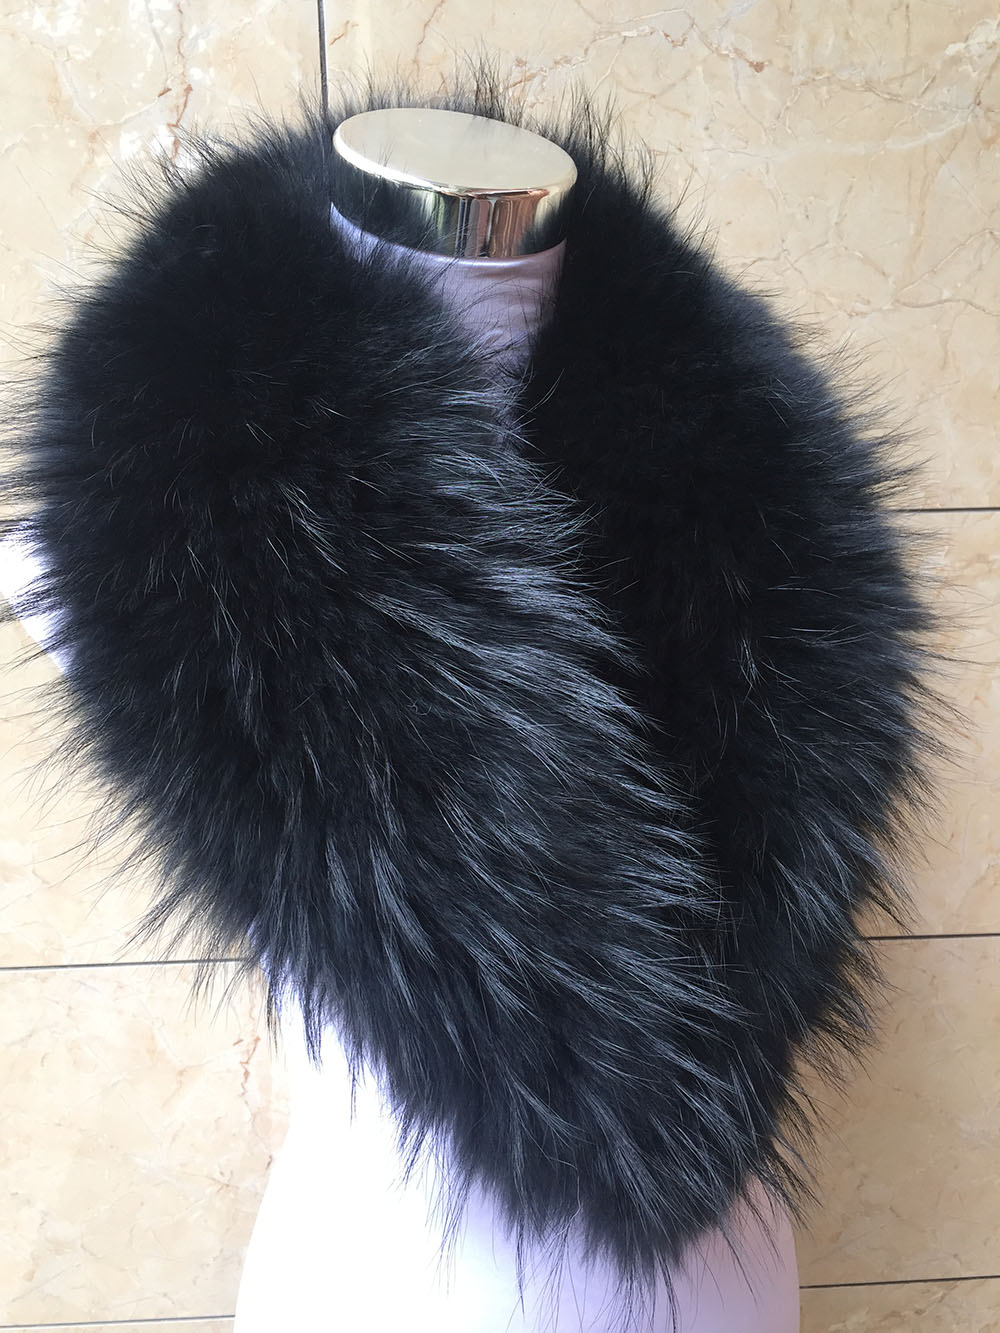 50cm Women Real Vulpes Lagopus Fox Fur Collar Real Fur Scarf Winter Warmer Neck